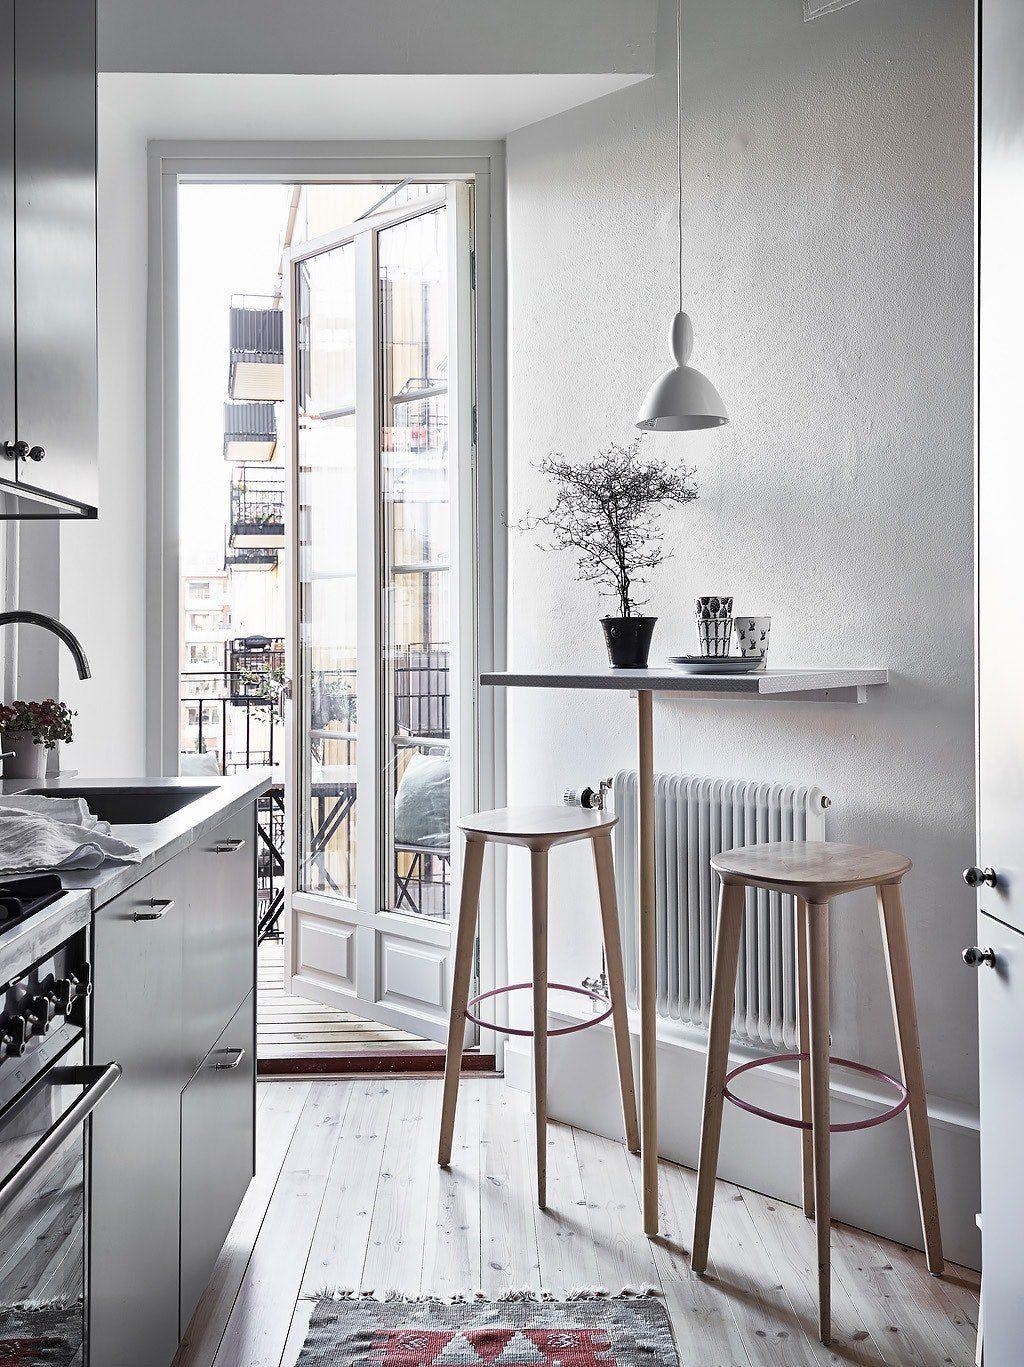 Ikea White Kitchen Design Pictures Remodel Decor And Ideas